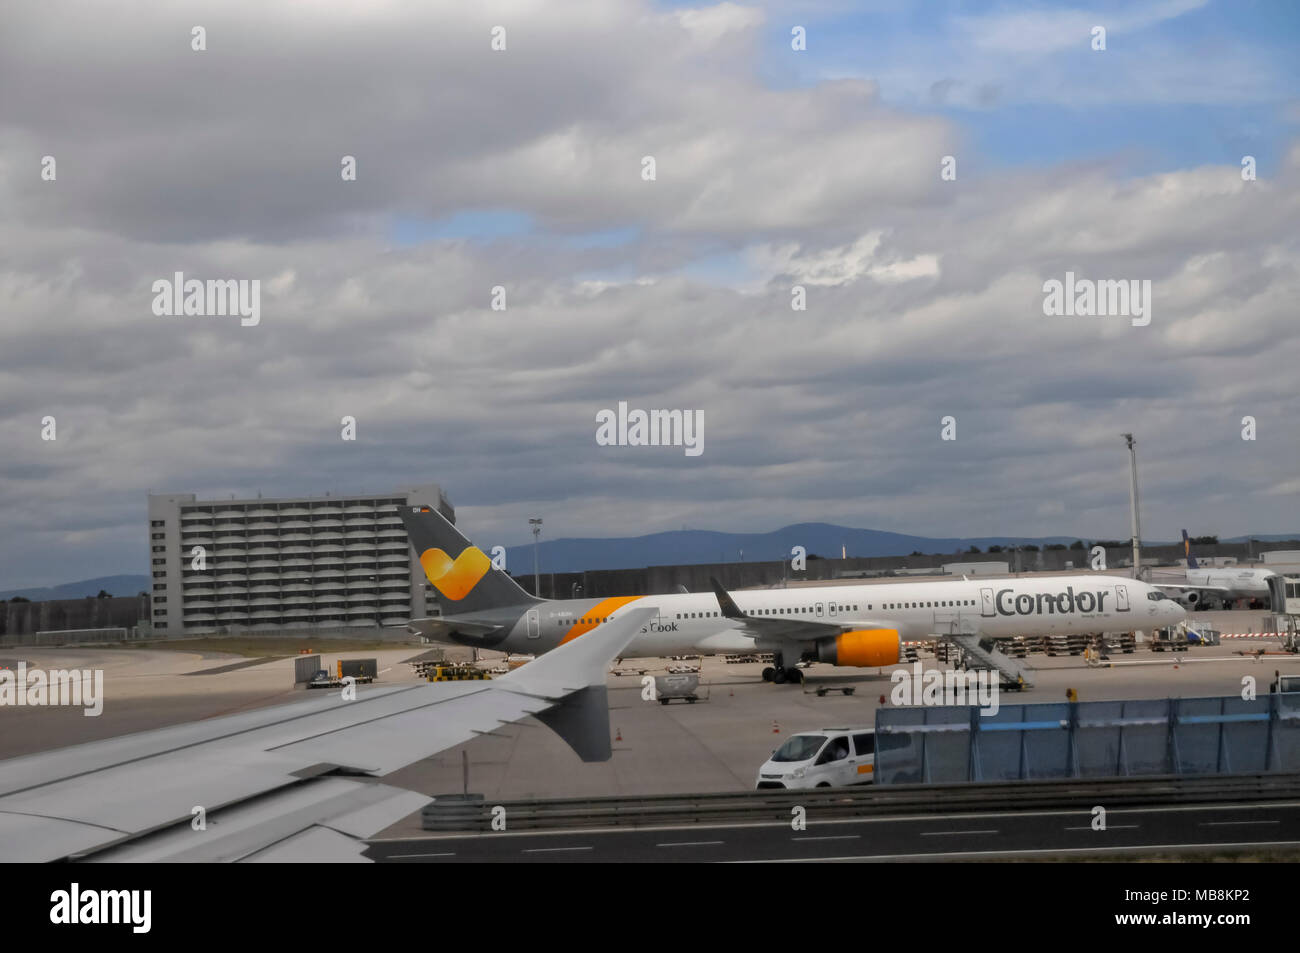 Germany, The Frankfurt airport - Stock Image